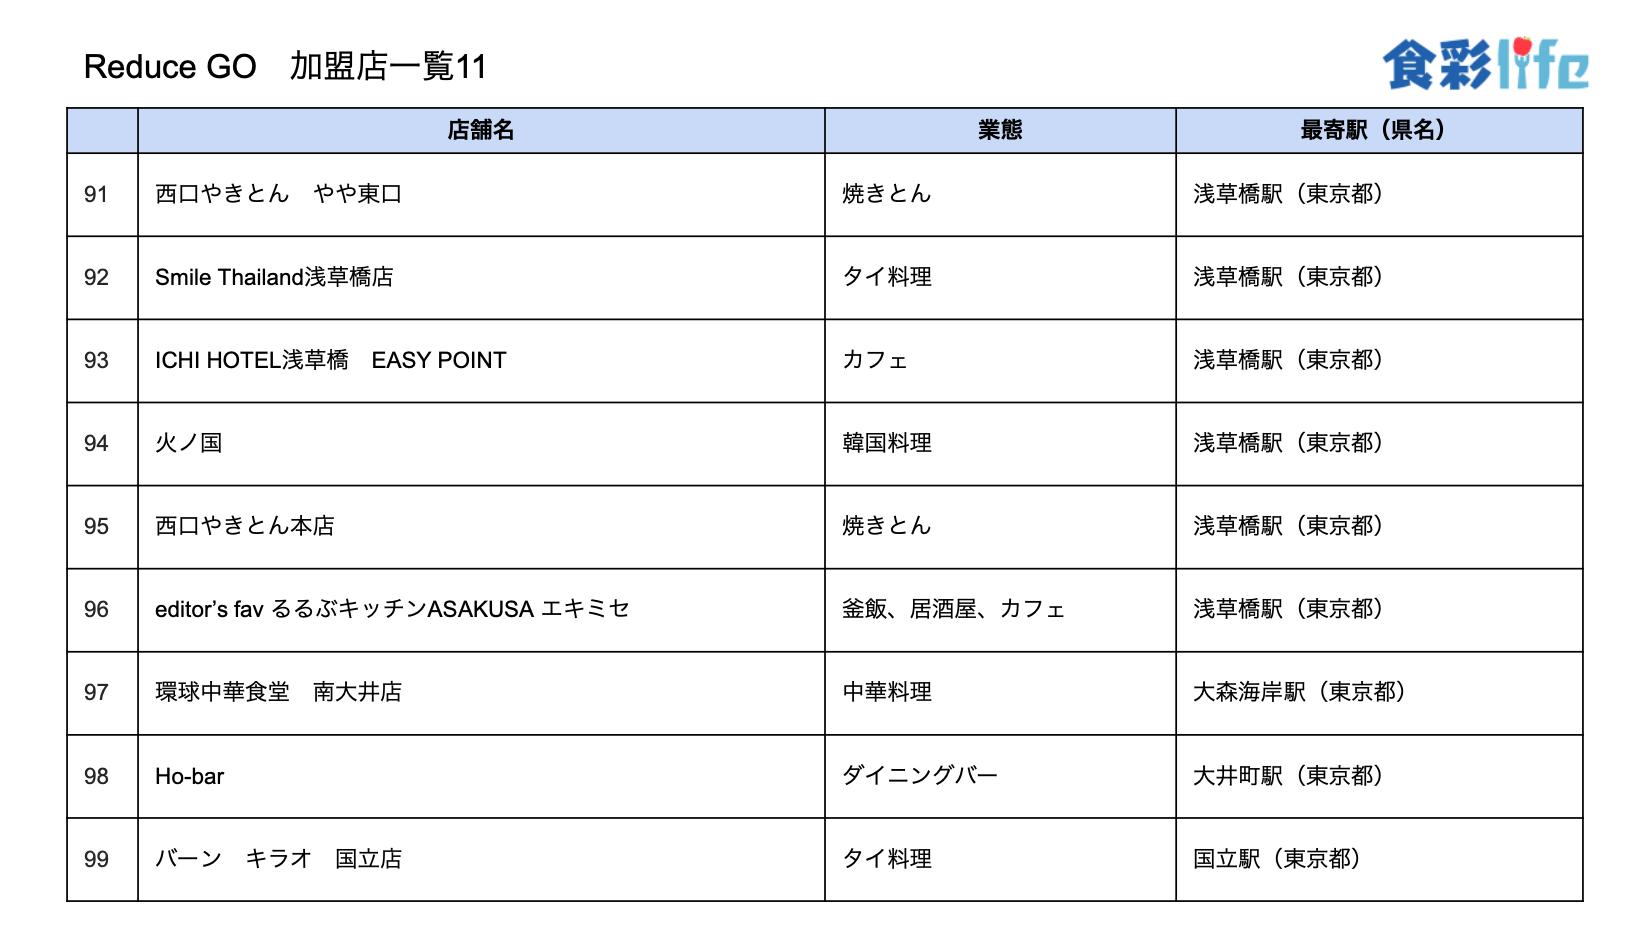 「ReduceGo」加盟店一覧11 (2020.3.18)